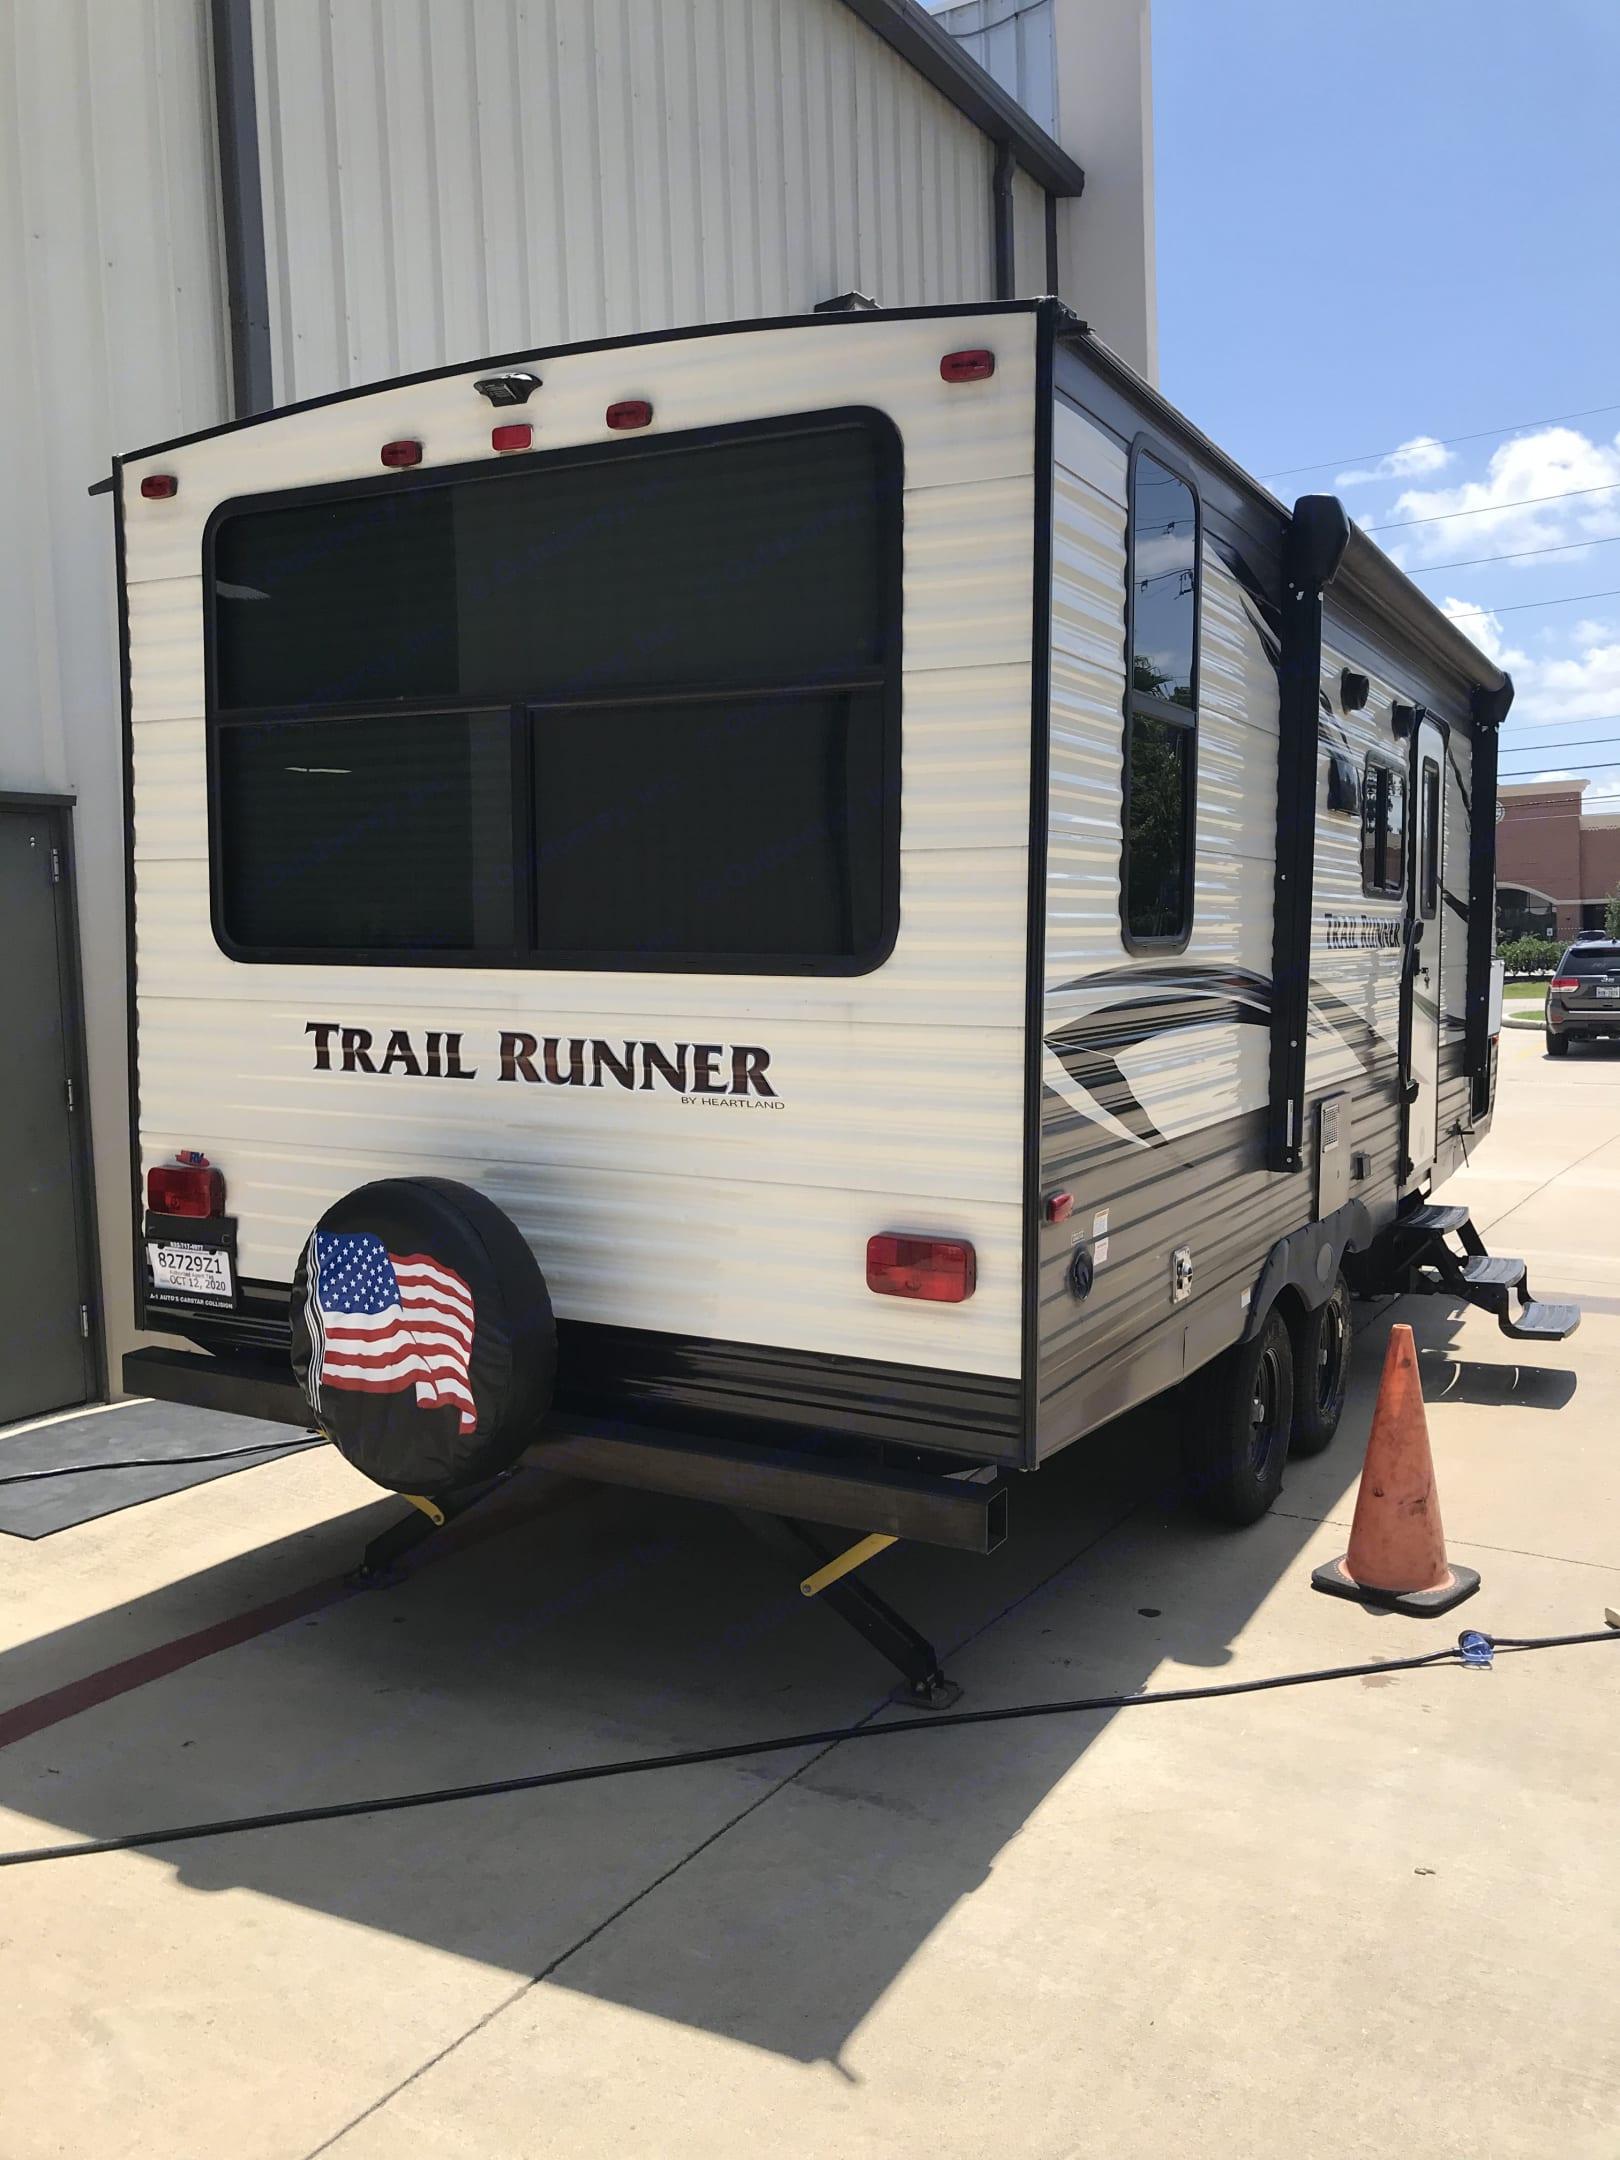 Rt Rear. Heartland Trail Runner 2019